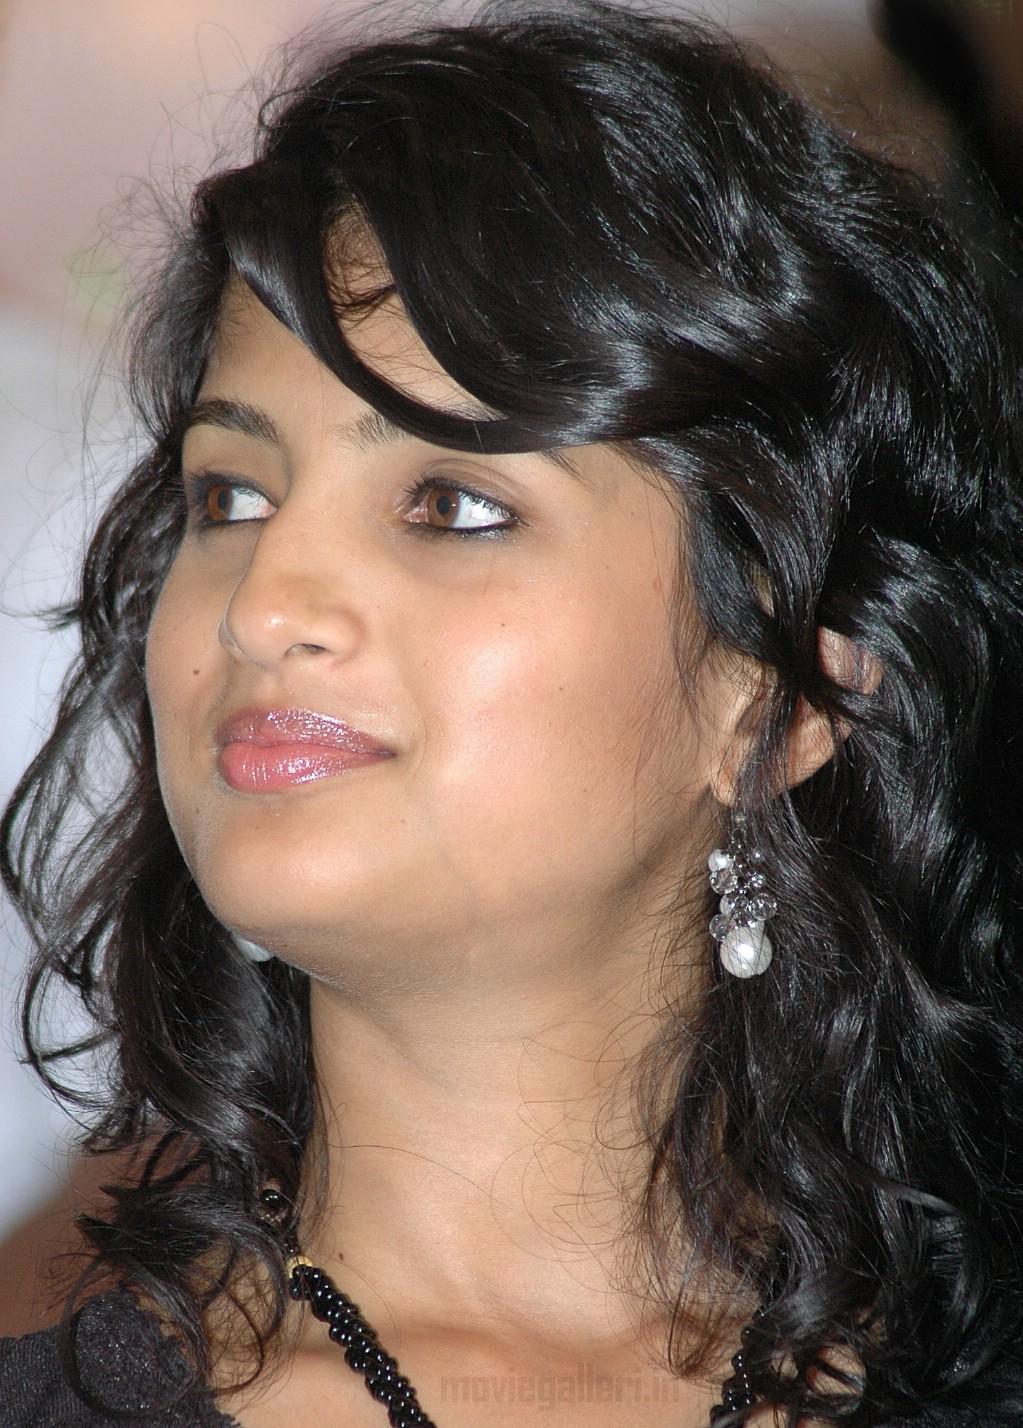 Image Gallery pics s <b>tamil aunty koothi kathai</b> story kamistad celebrity - pasanga_tamil_actress_vega_stills_pics_07